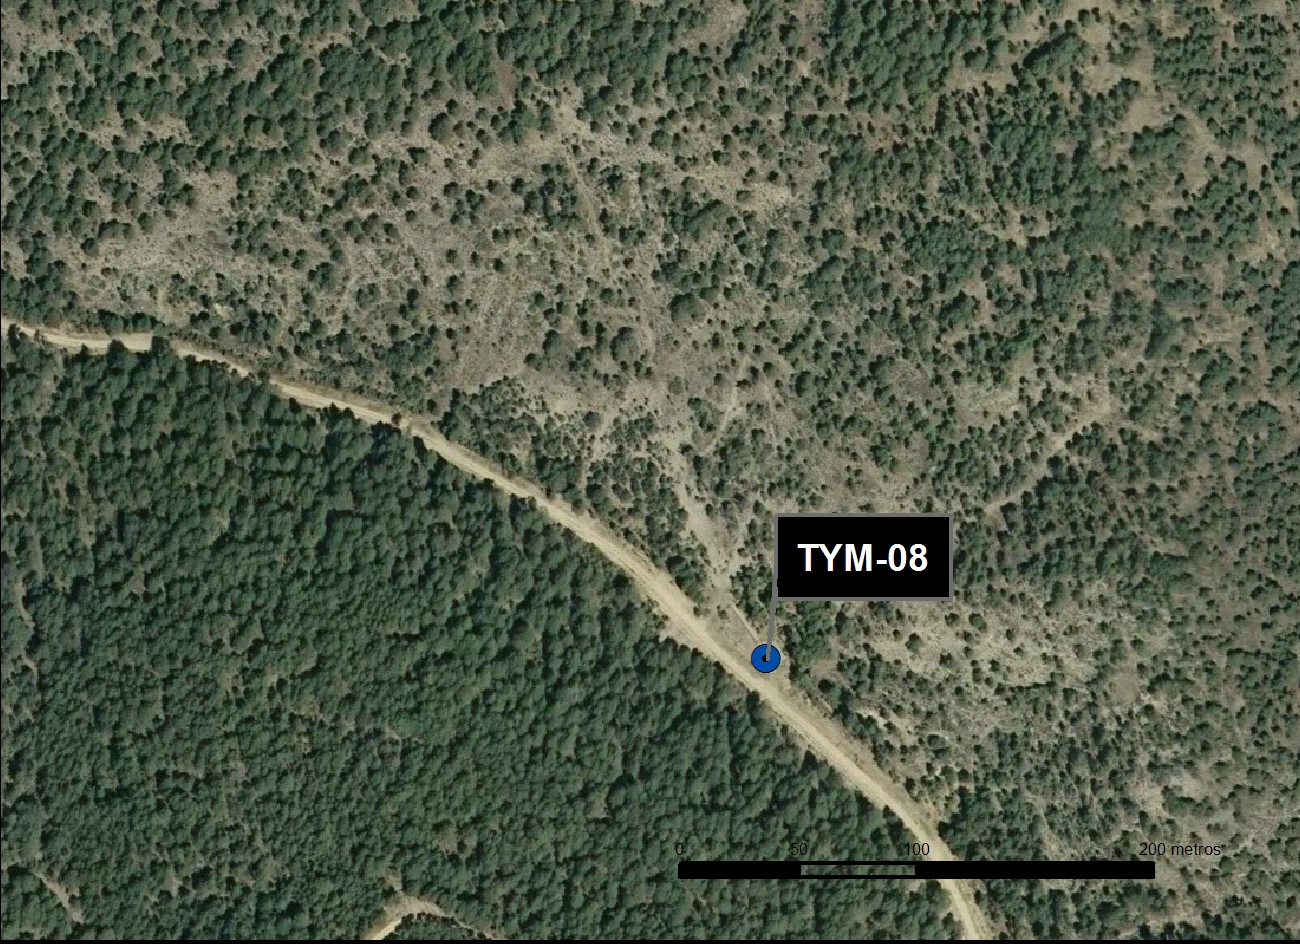 TYM_08_M.V.LOZANO_FONTARRONES II_ORTO 1